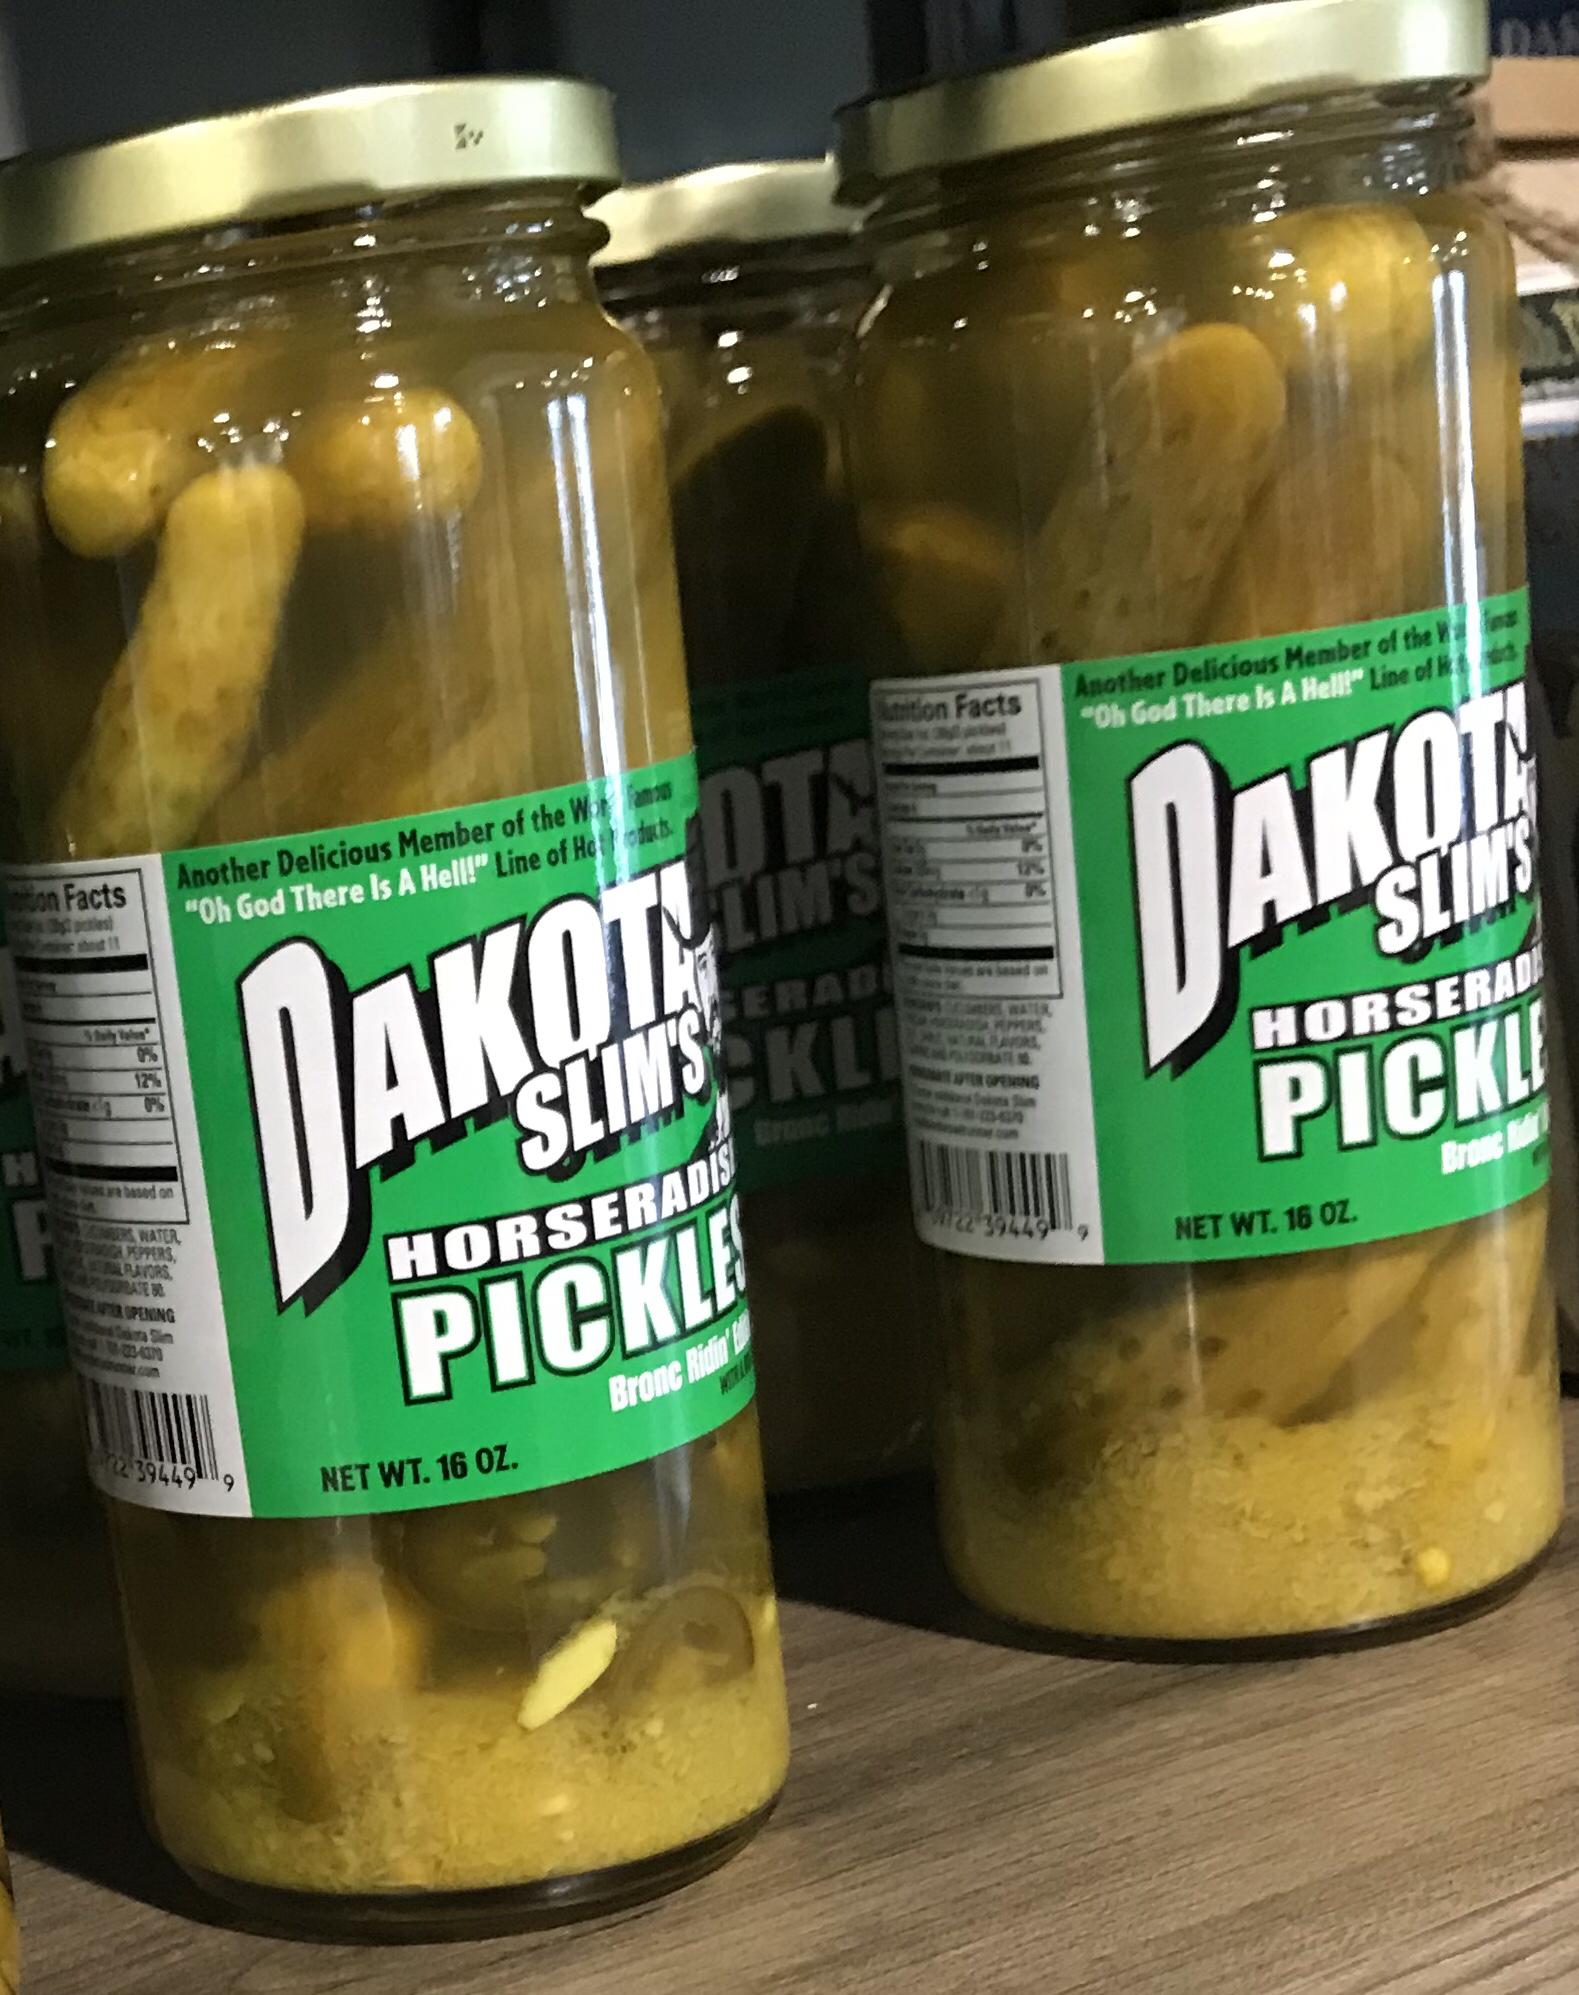 Dakota Slim's Horseradish Pickles 16oz 609722394499